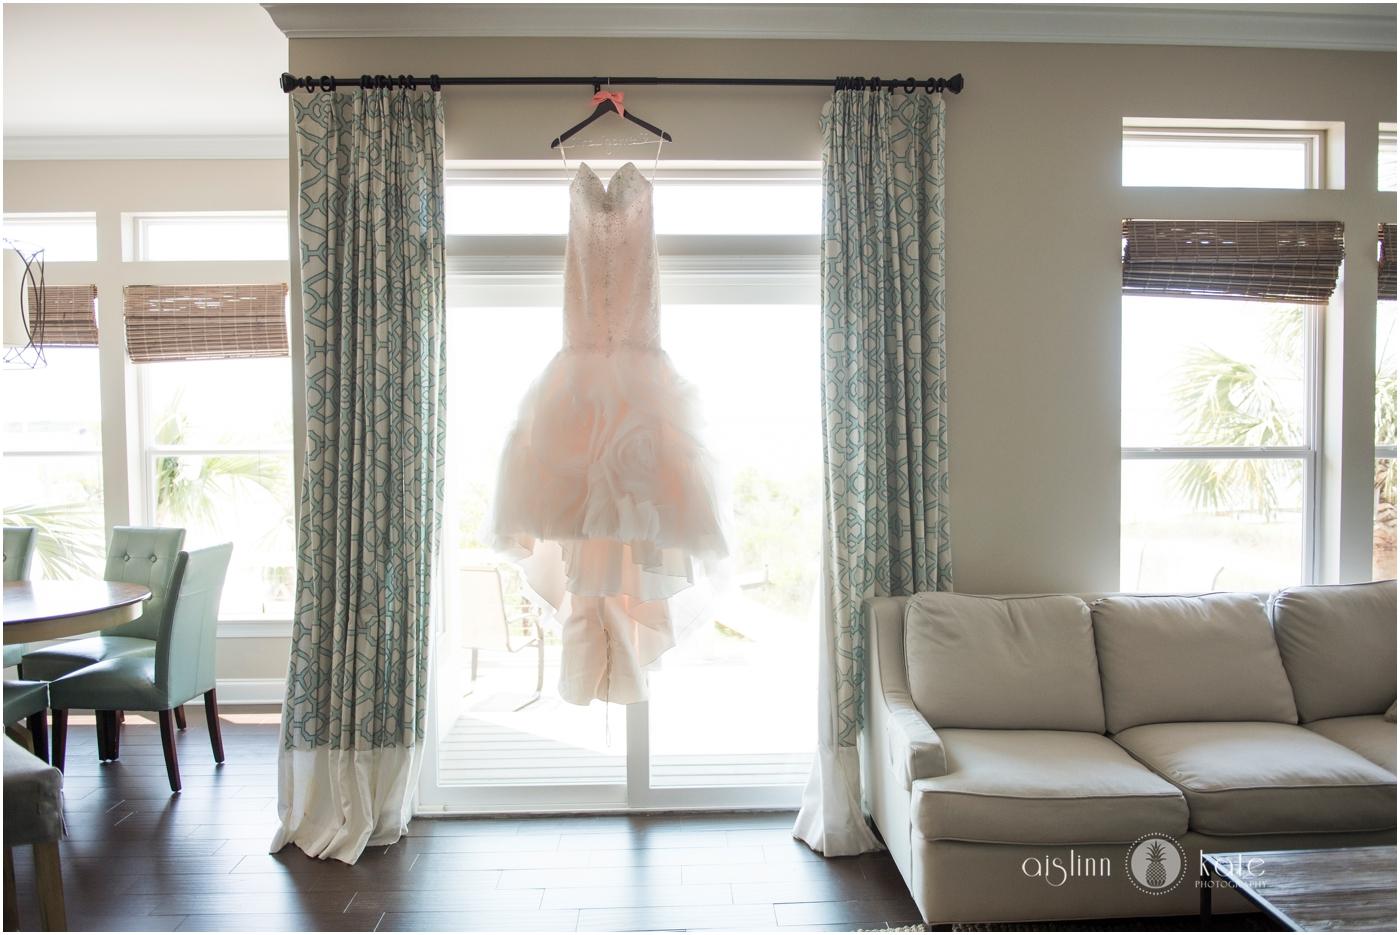 Pensacola-Destin-Wedding-Photographer_6010.jpg